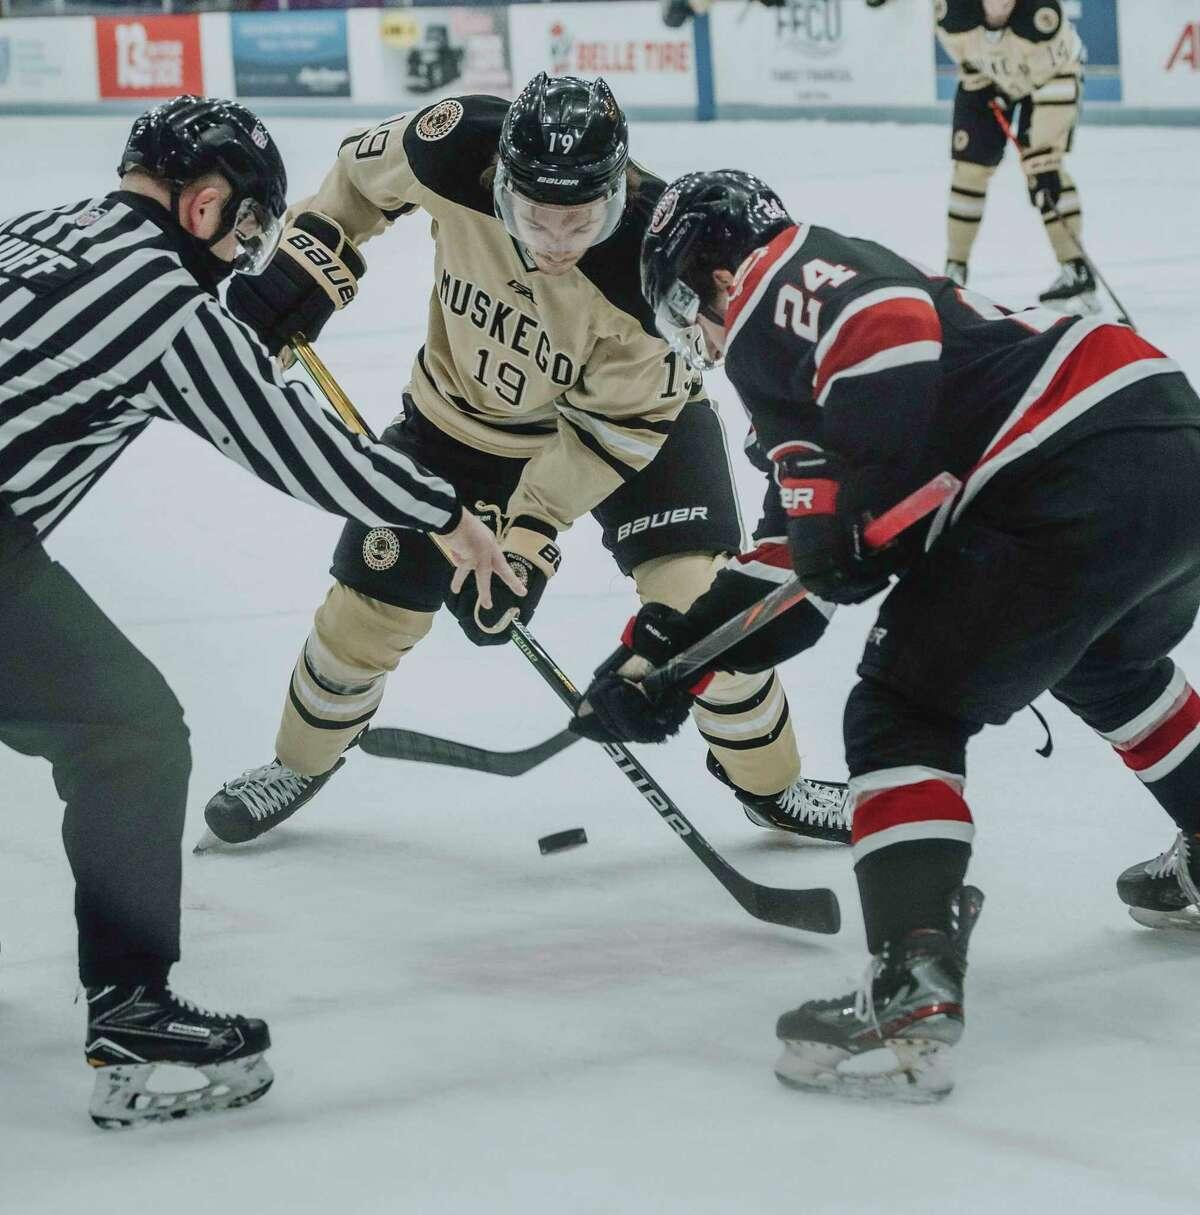 Big Rapids' Bradley Marek (19) played with the Muskegon Lumberjacksin the USHLlast seasonwill be joining Ferris State's hockey program this year. (Photo courtesy of the Muskegon Lumberjacks)